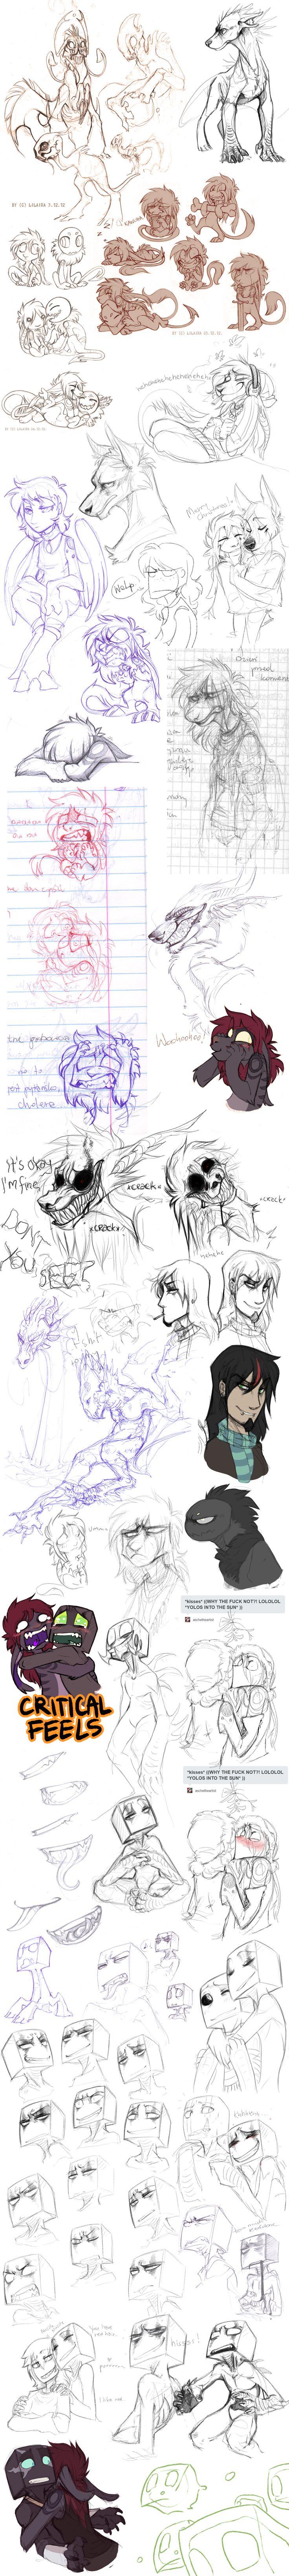 (top half) Sketch dump 45 by LiLaiRa.deviantart.com on @deviantART